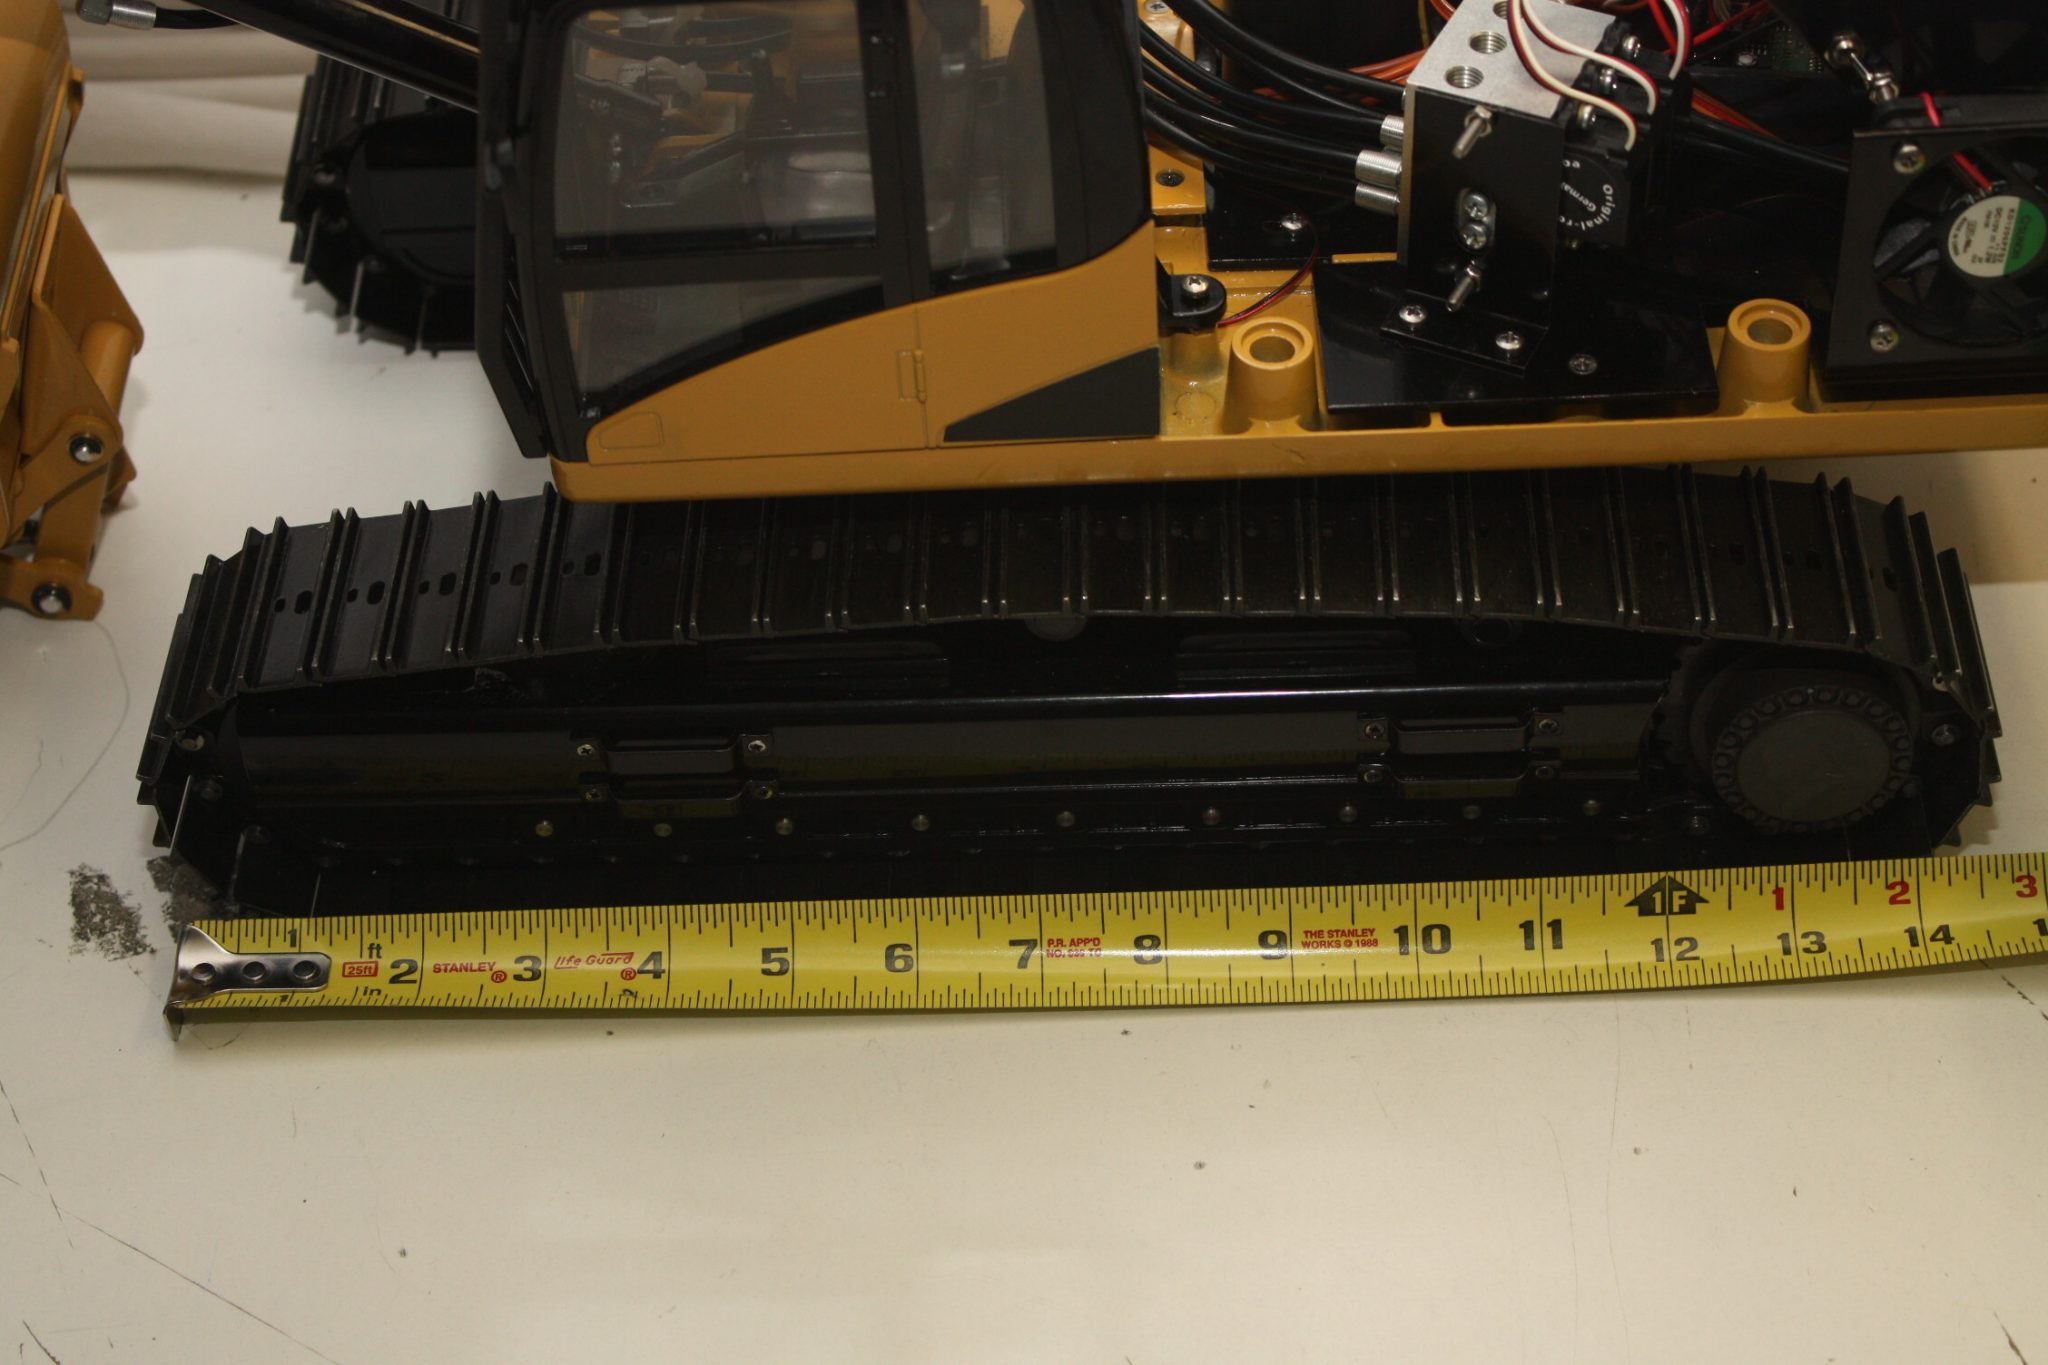 wedico cat 345 d lme hydraulic excavator vcshobbies vcshobbies